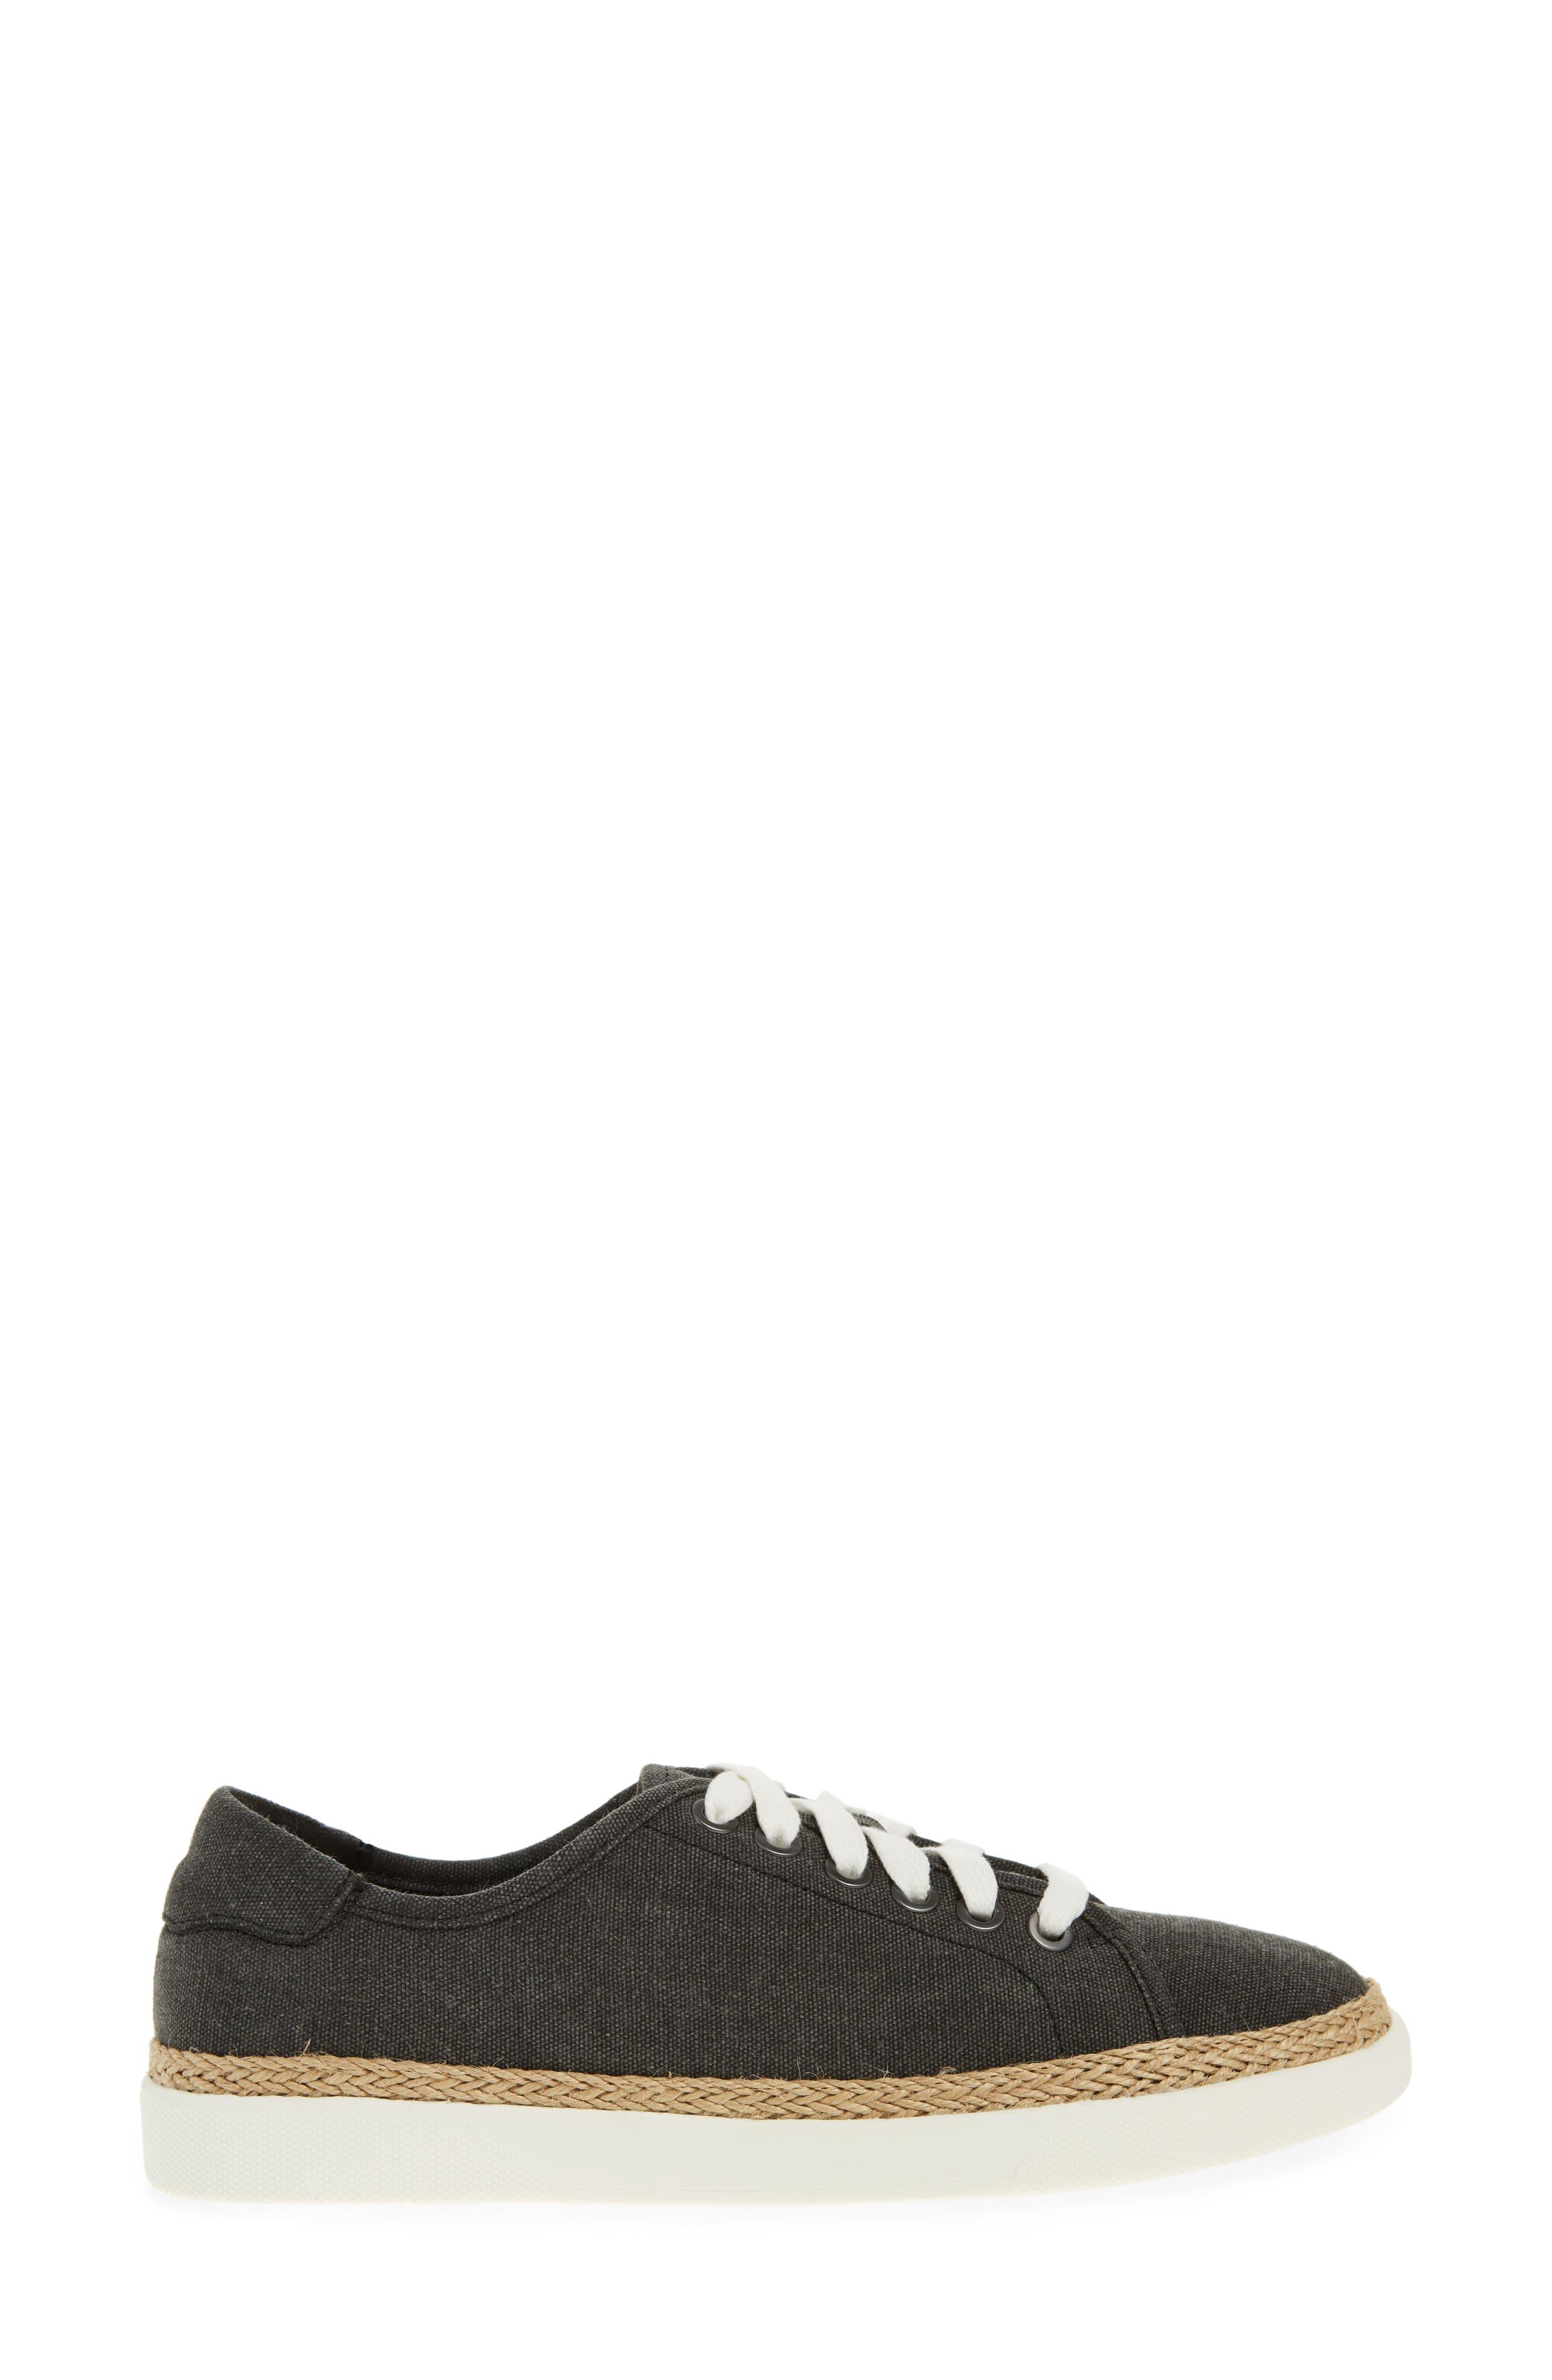 Hattie Sneaker,                             Alternate thumbnail 3, color,                             001